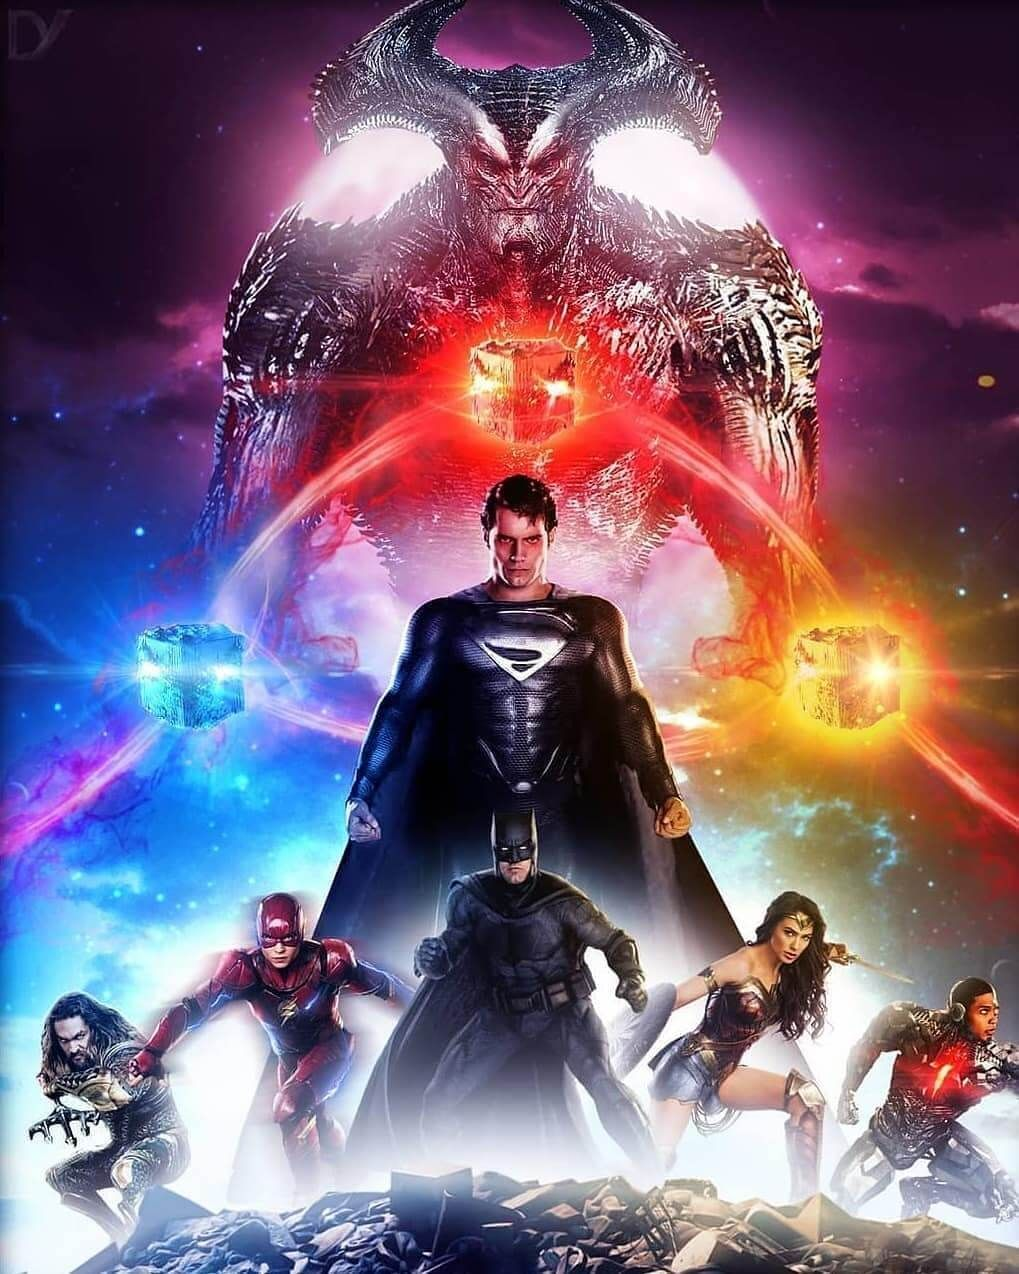 Justice League Dark Apokolips War Action Series 2021 In 2021 Justice League Comics Justice League Dark Justice League